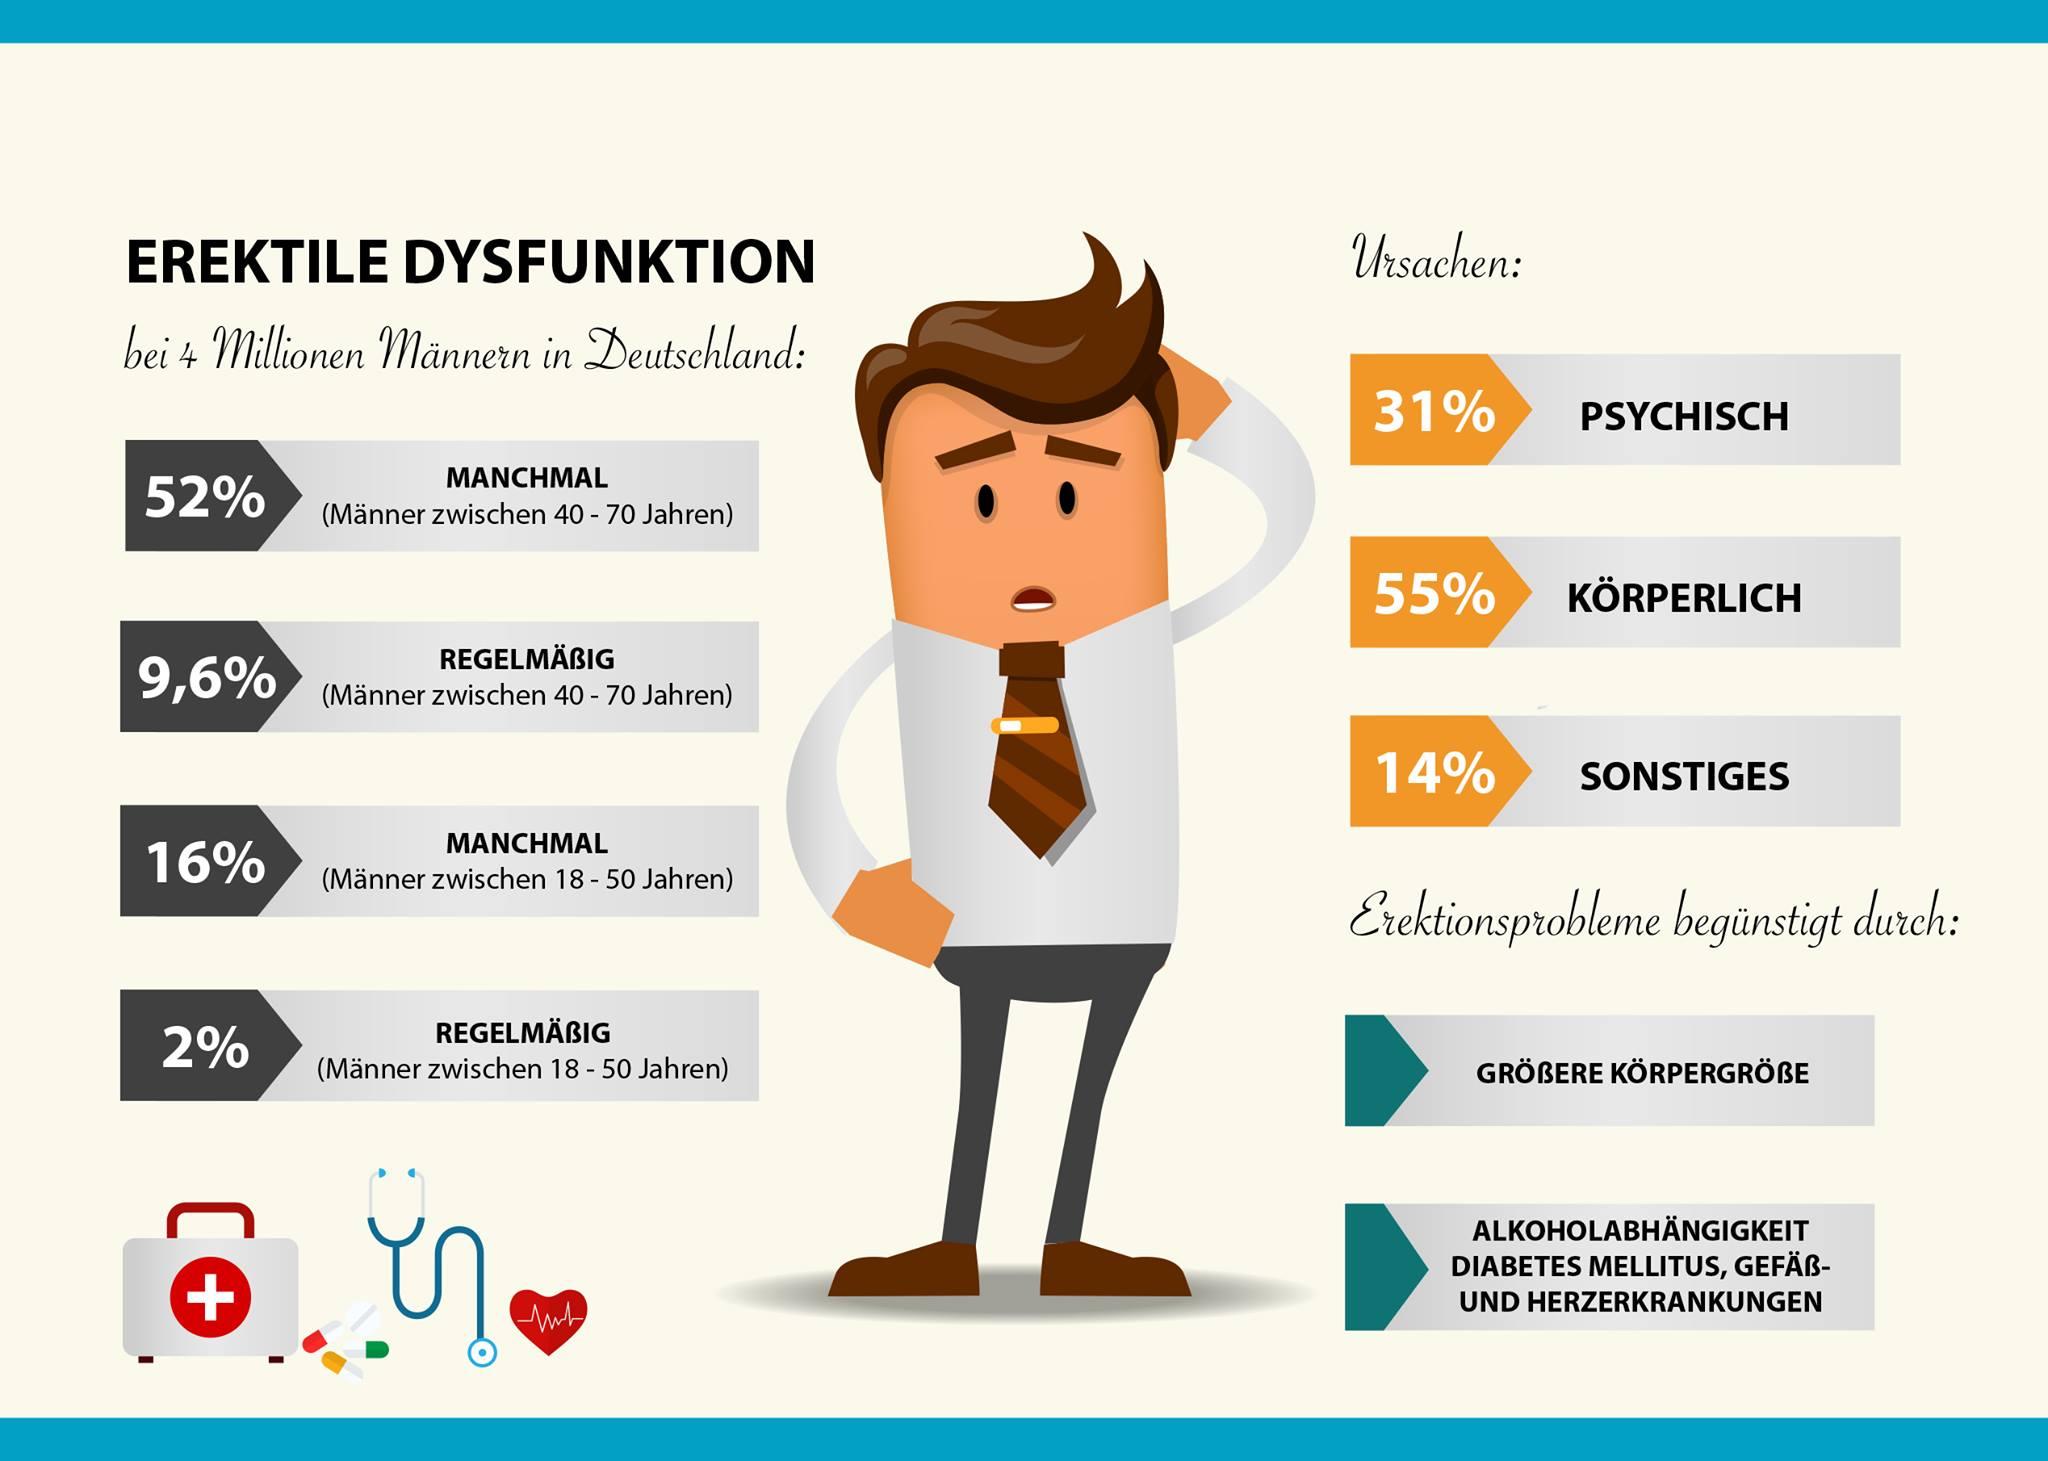 Ursachen Symptome Impotenz Erektion